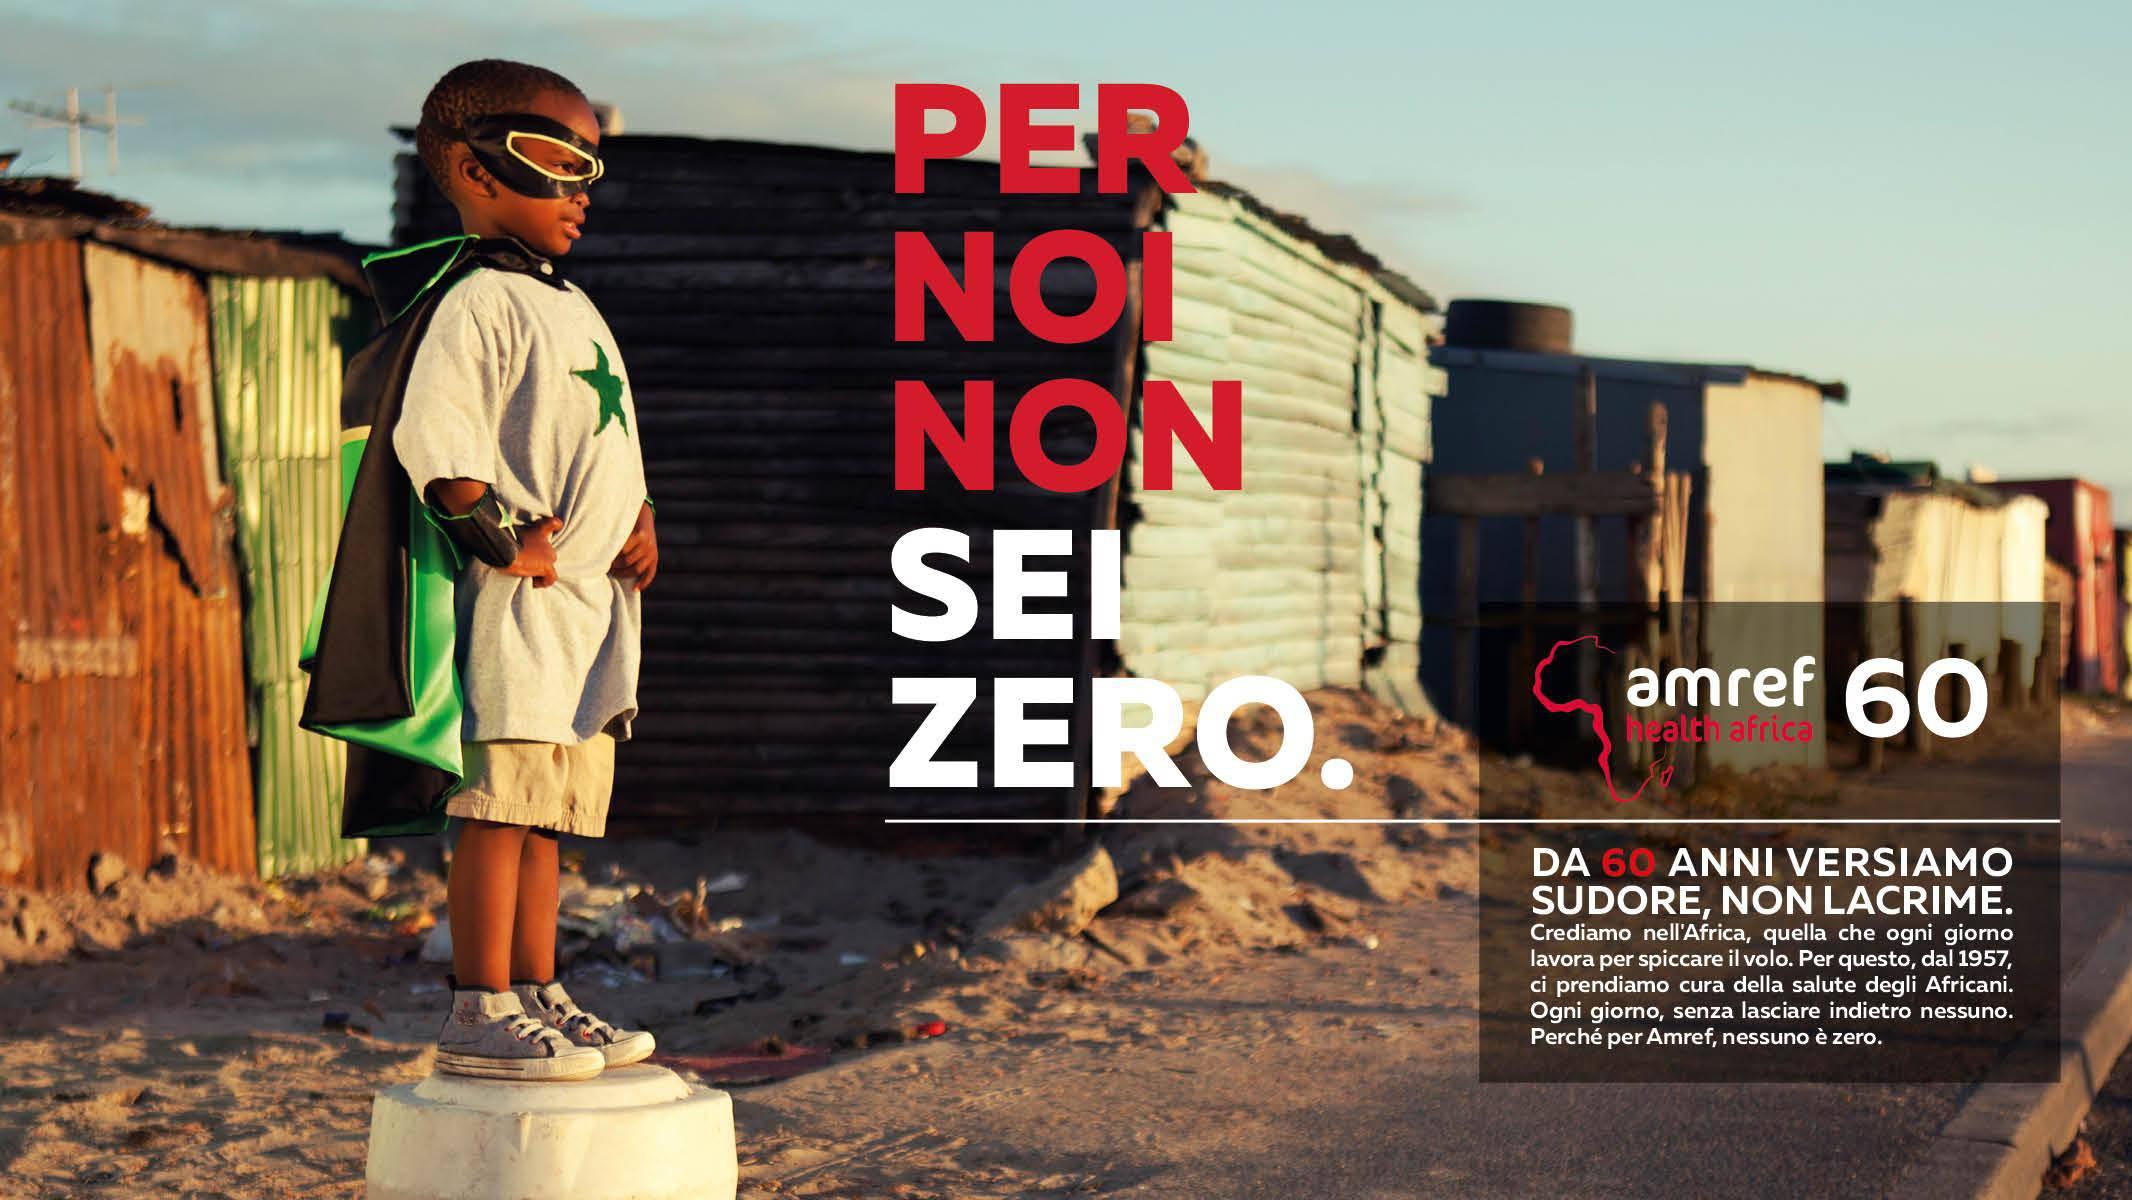 Africa per noi non sei zero